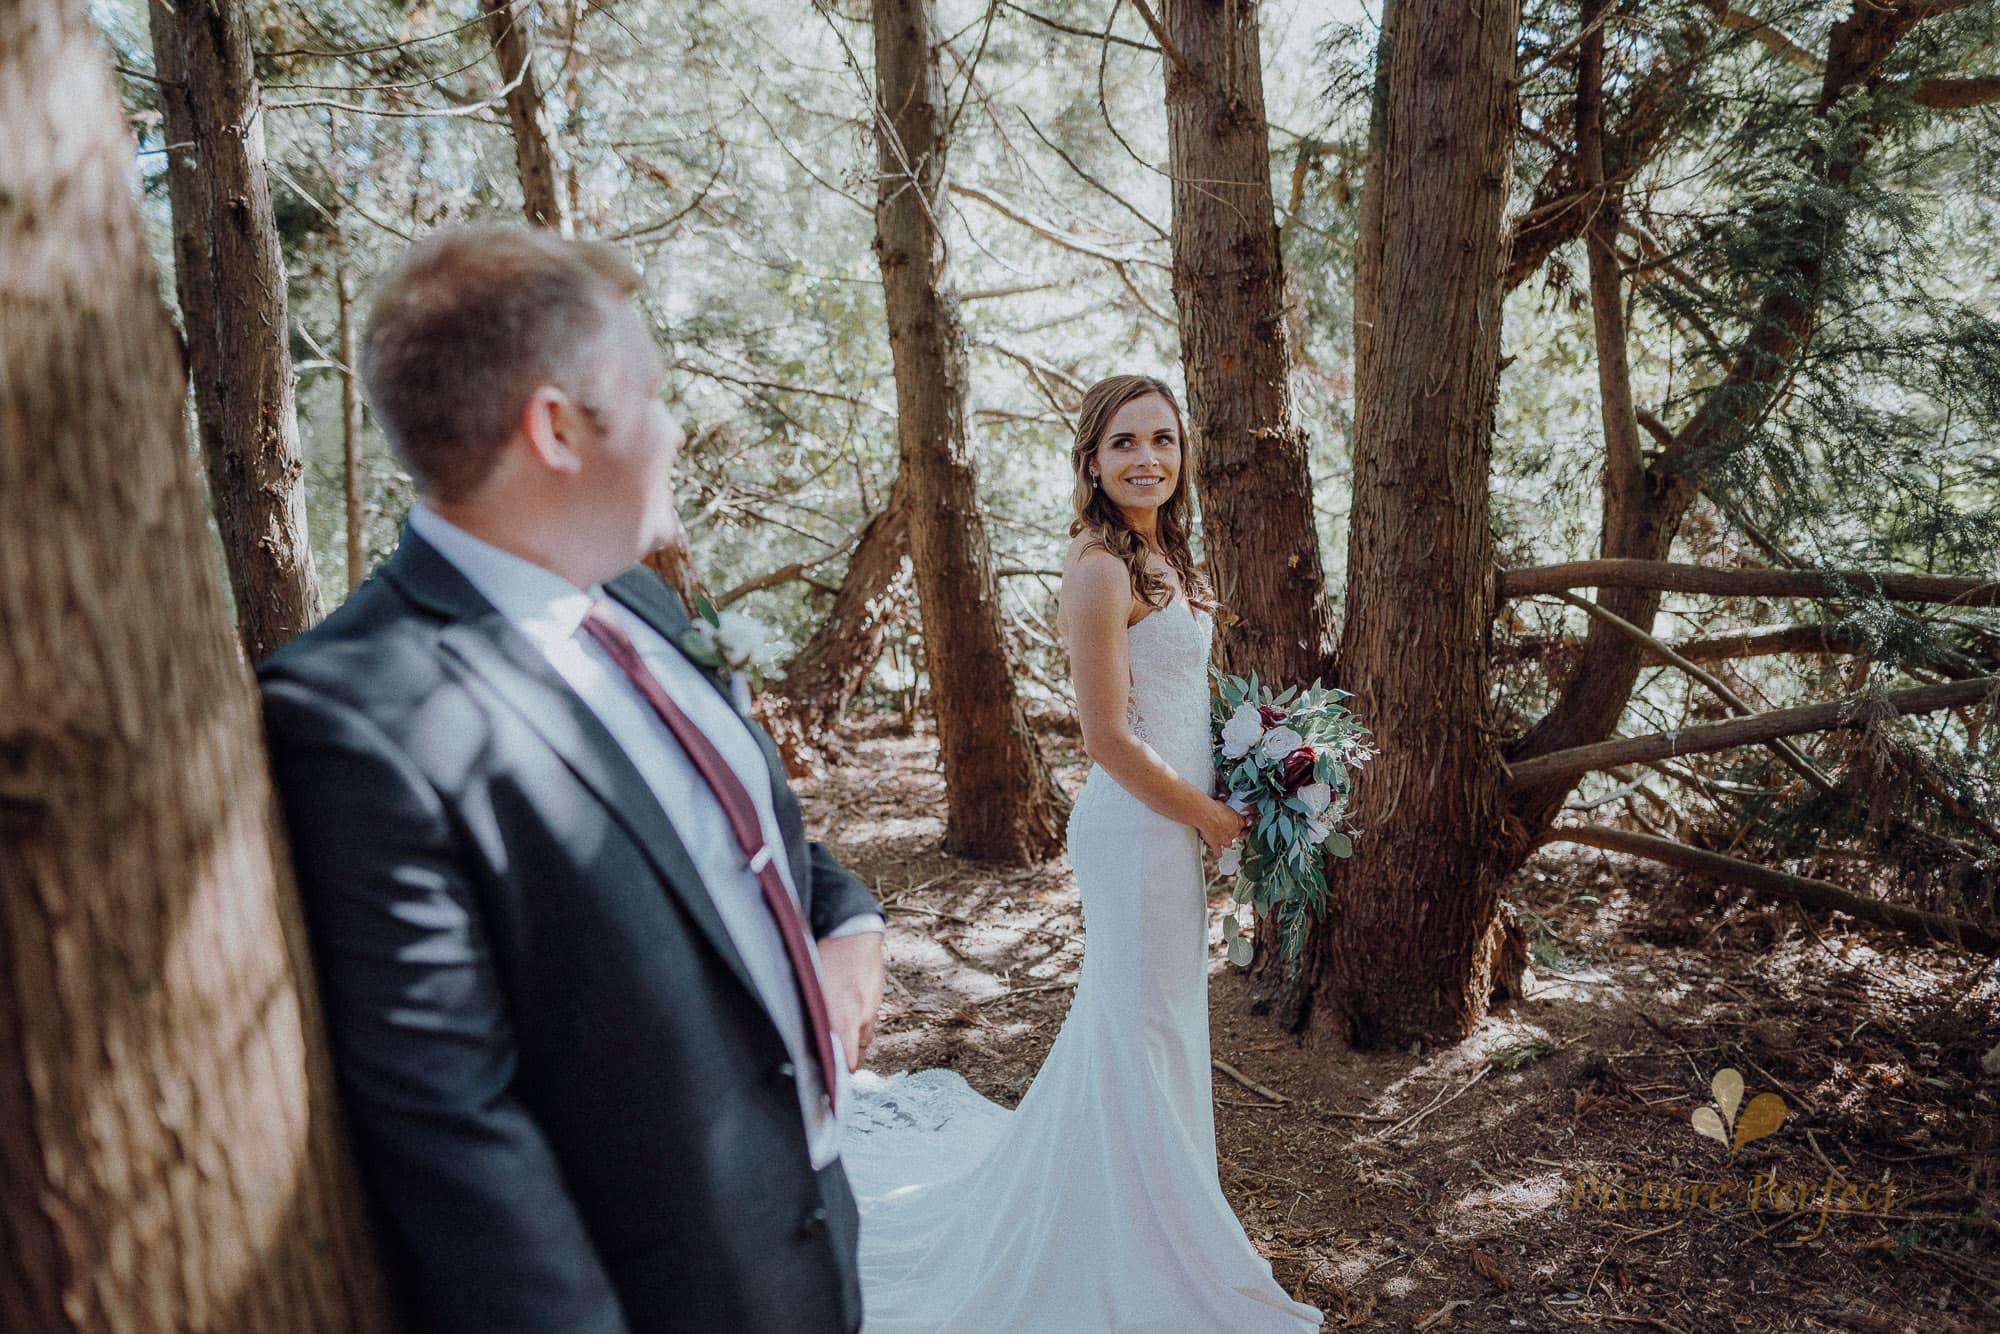 Roseburb Park wedding of Casey 3735